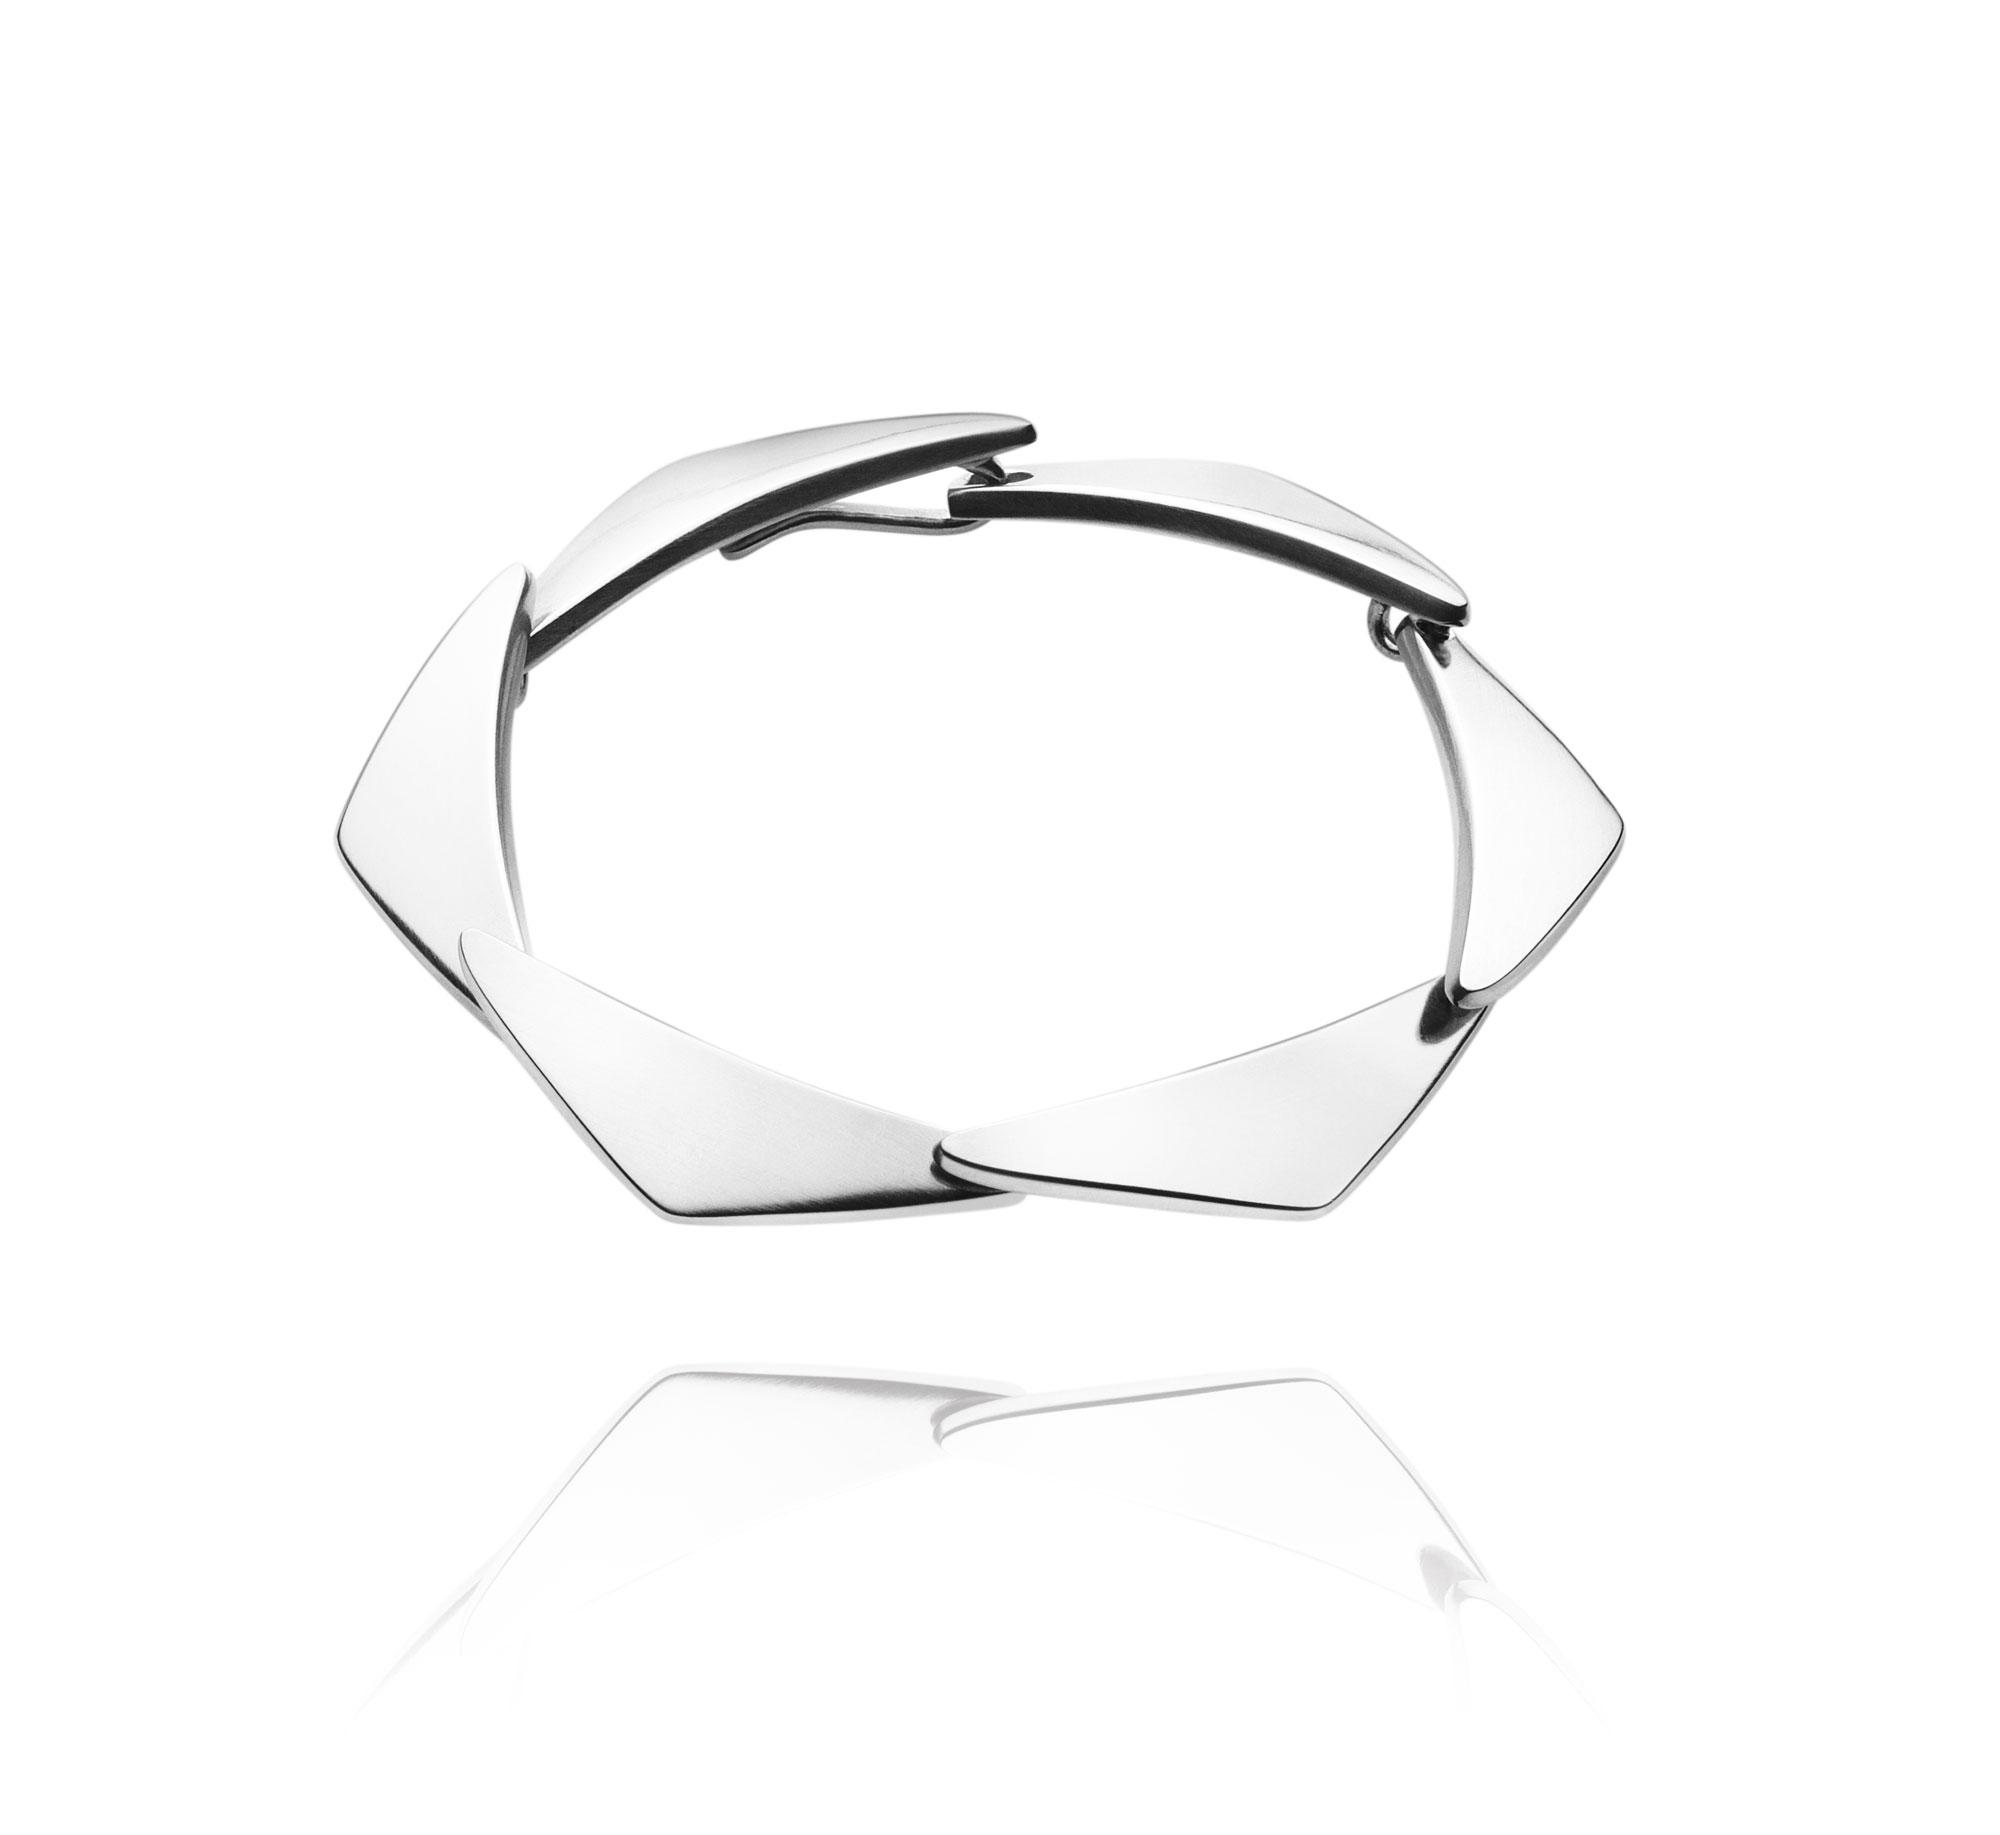 Georg Jensen PEAK armbånd med 7 led - 3531257 M/L - 19,5 centimeter